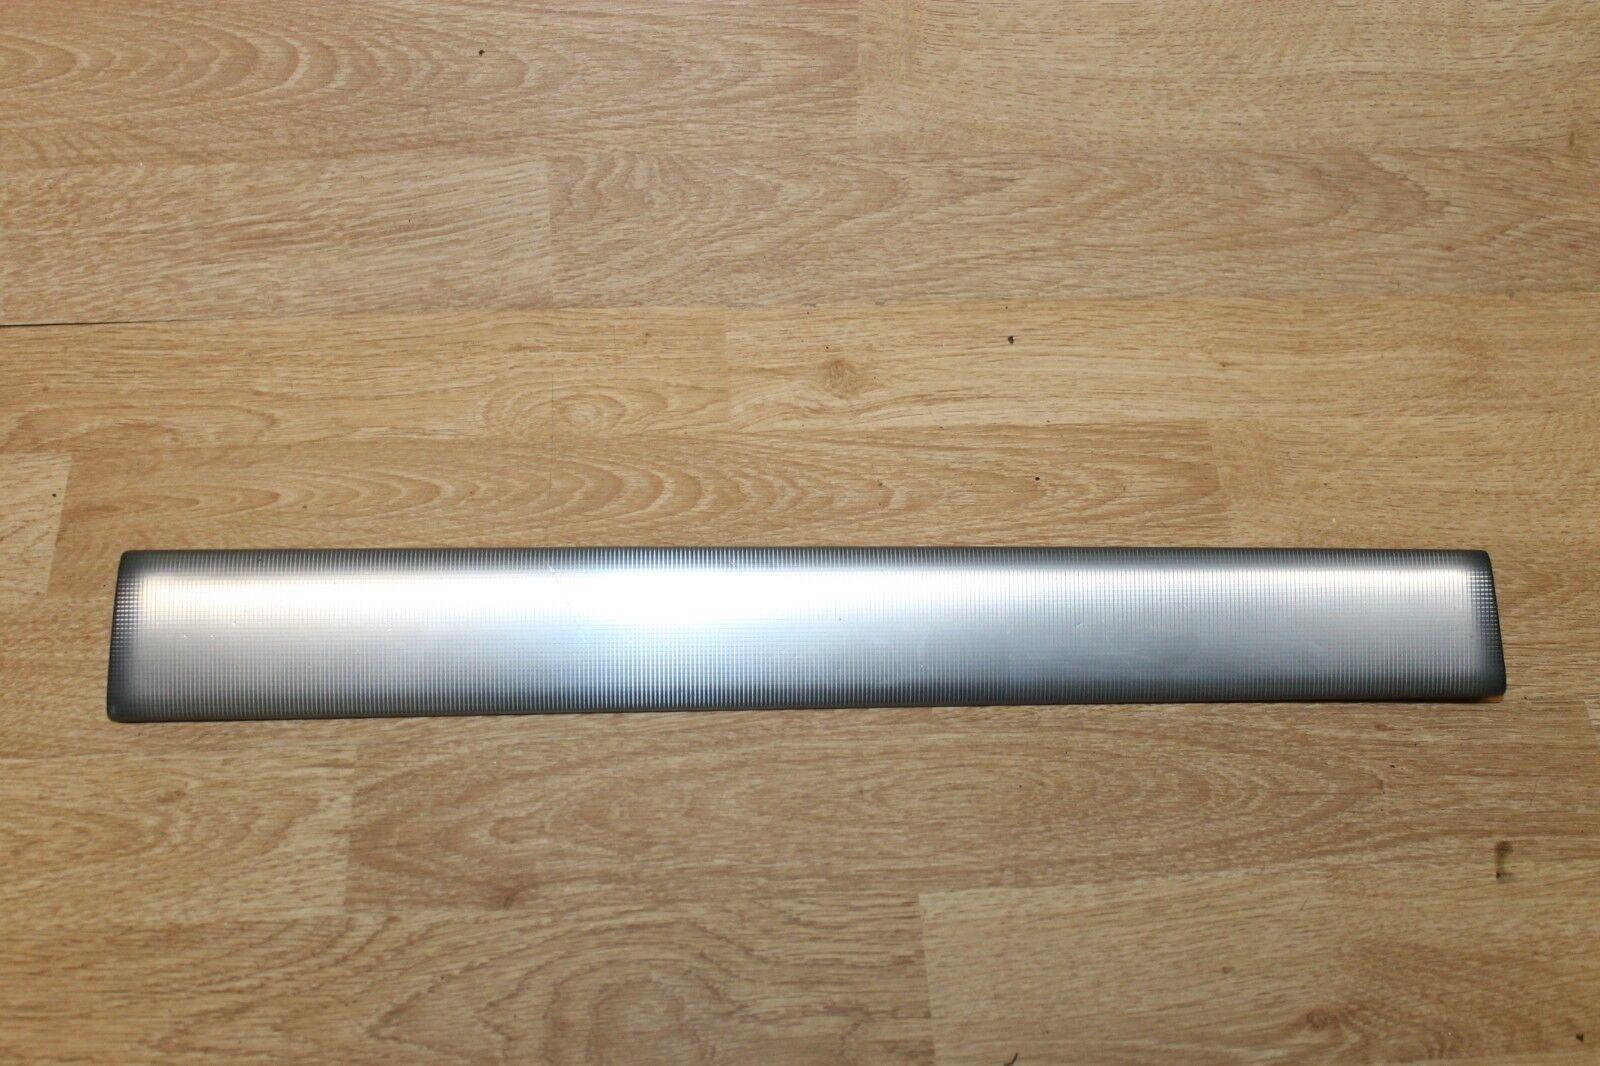 RHD VOLVO XC90 '04 FRONT DASH MOLDING STRIP DECOR # 8674969